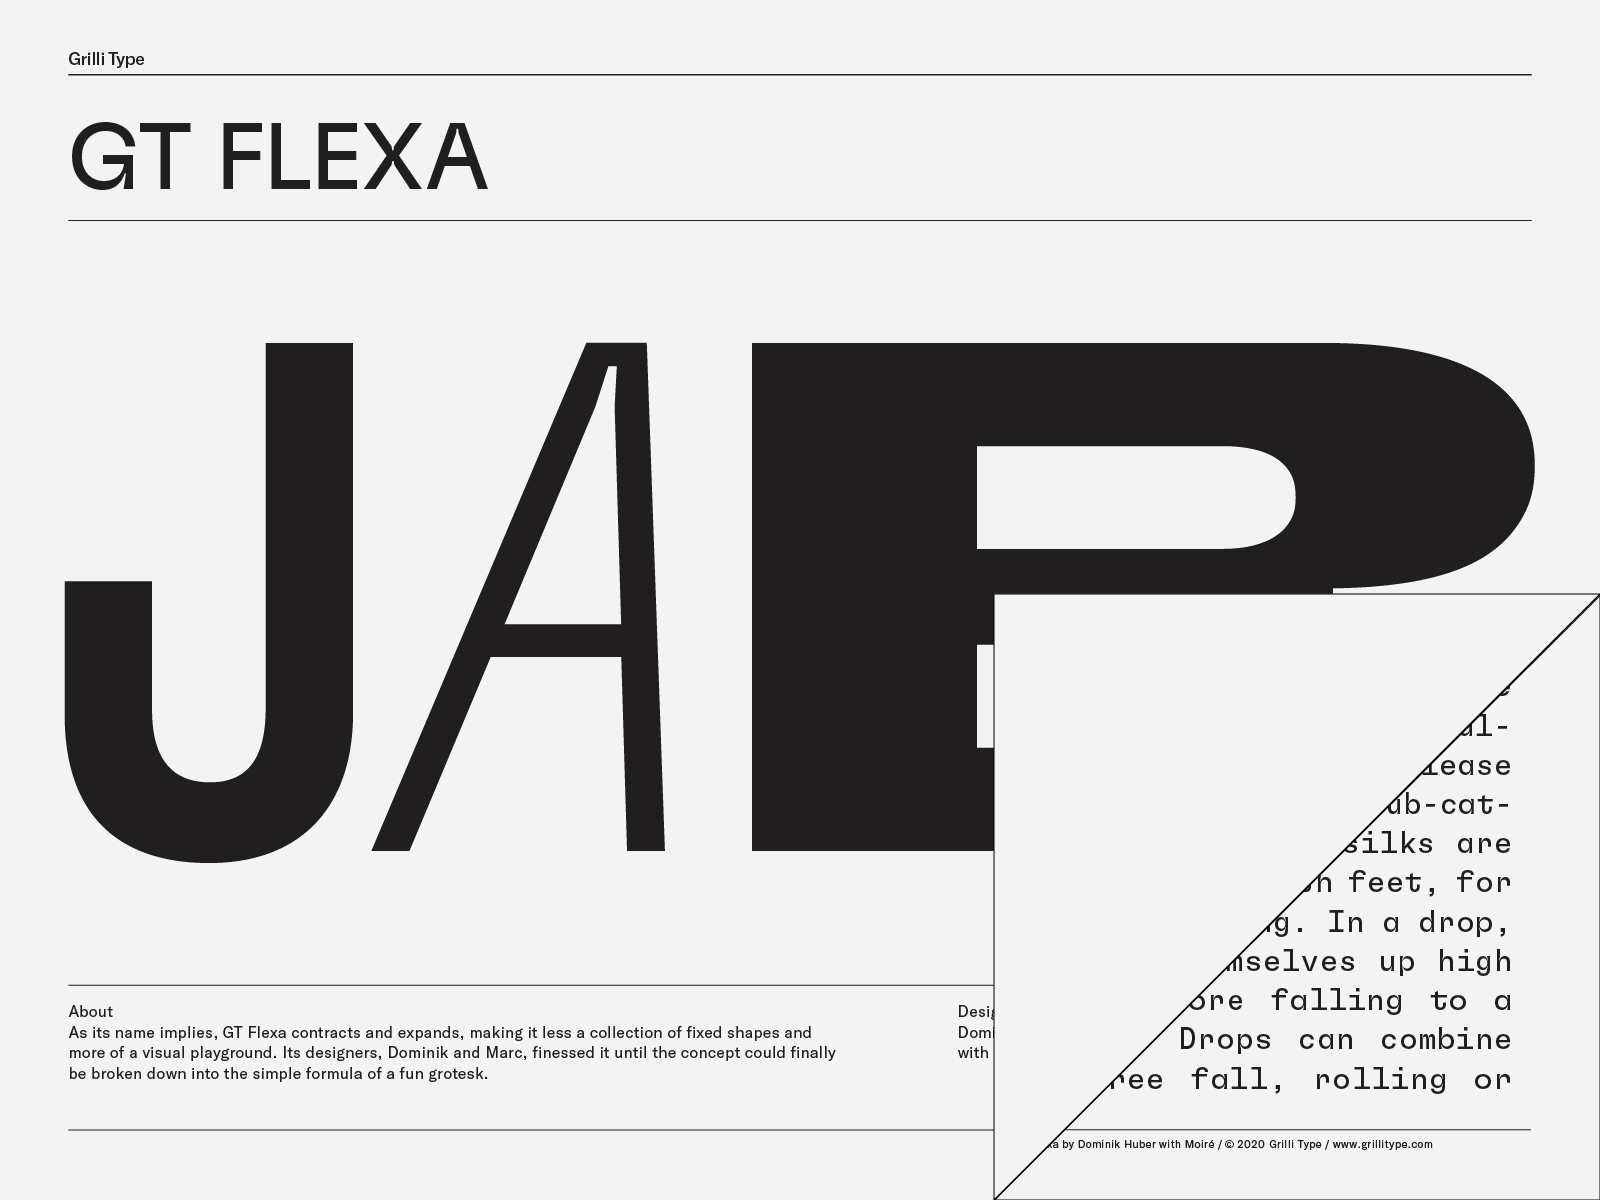 GT Flexa by Grillitype